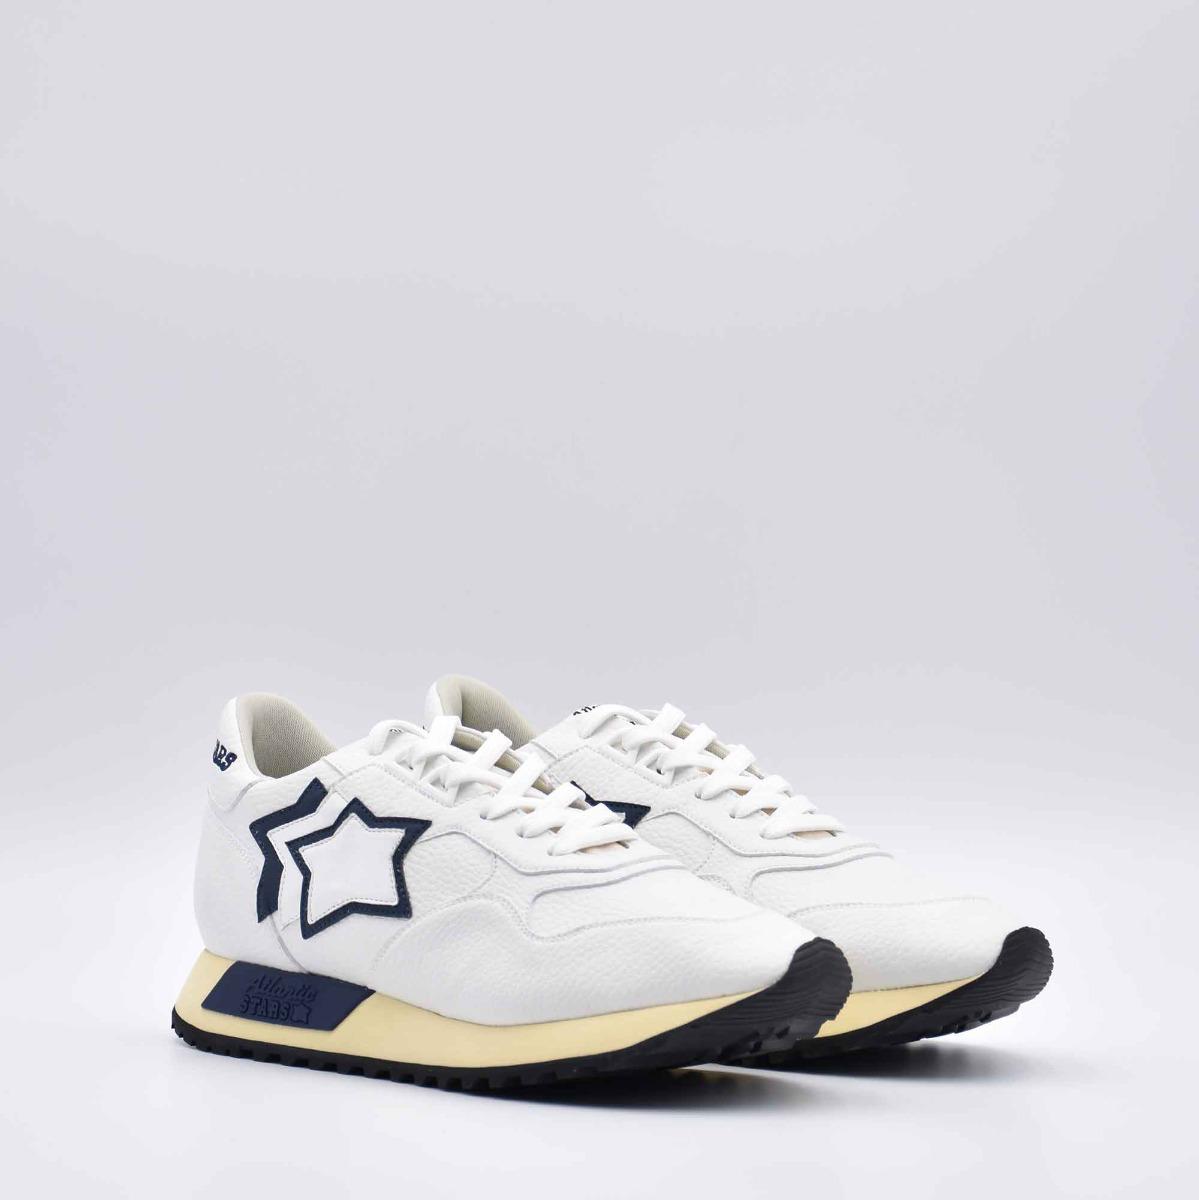 Sneaker draco dr07 - Bianco